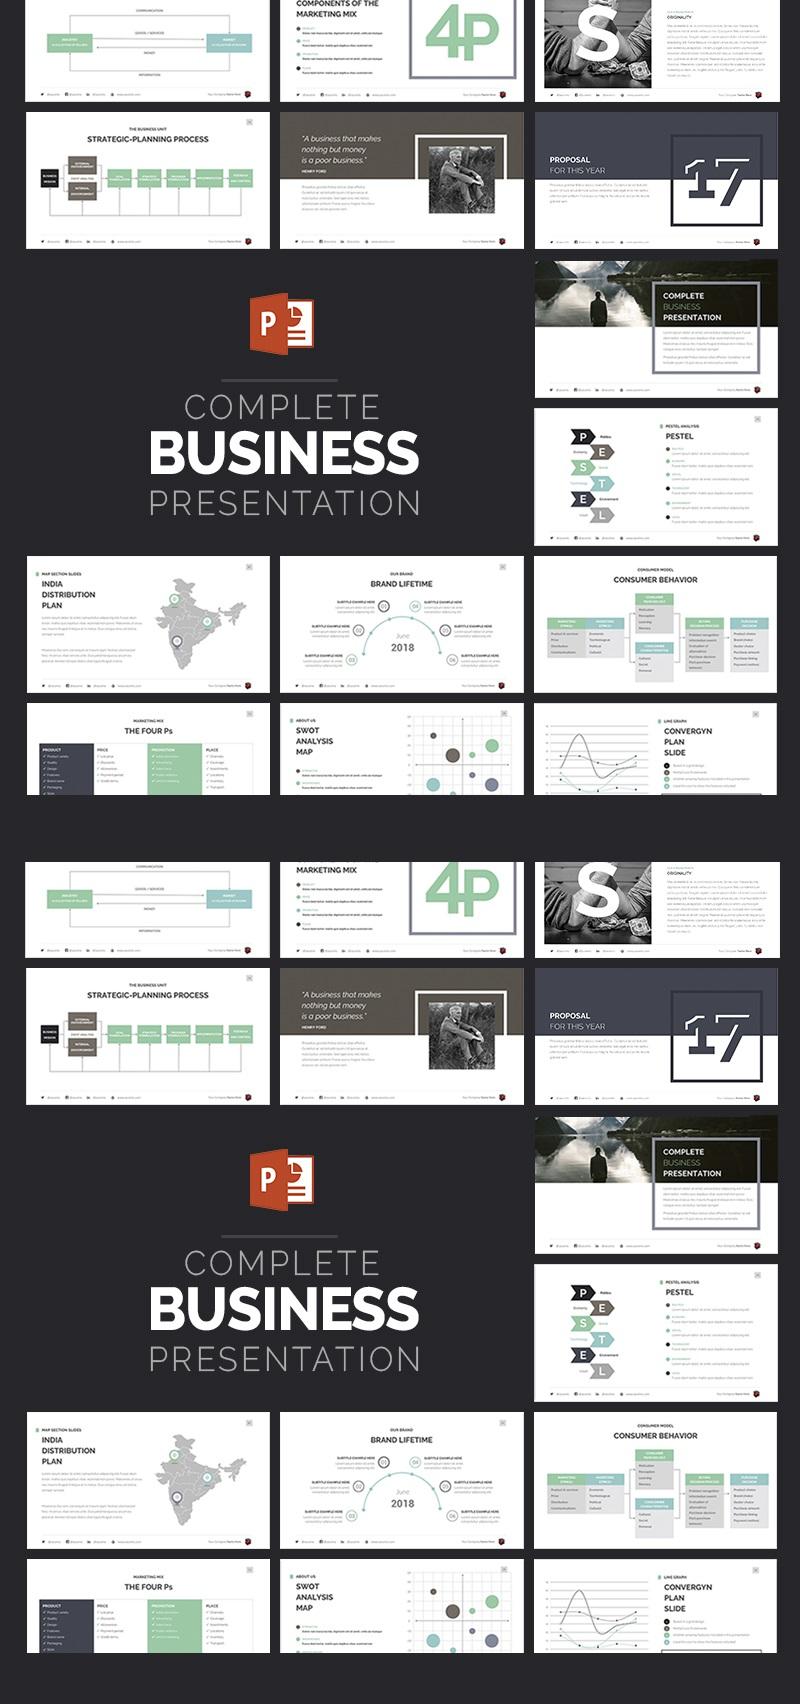 Complete Business Presentation PowerPoint sablon 63510 - képernyőkép